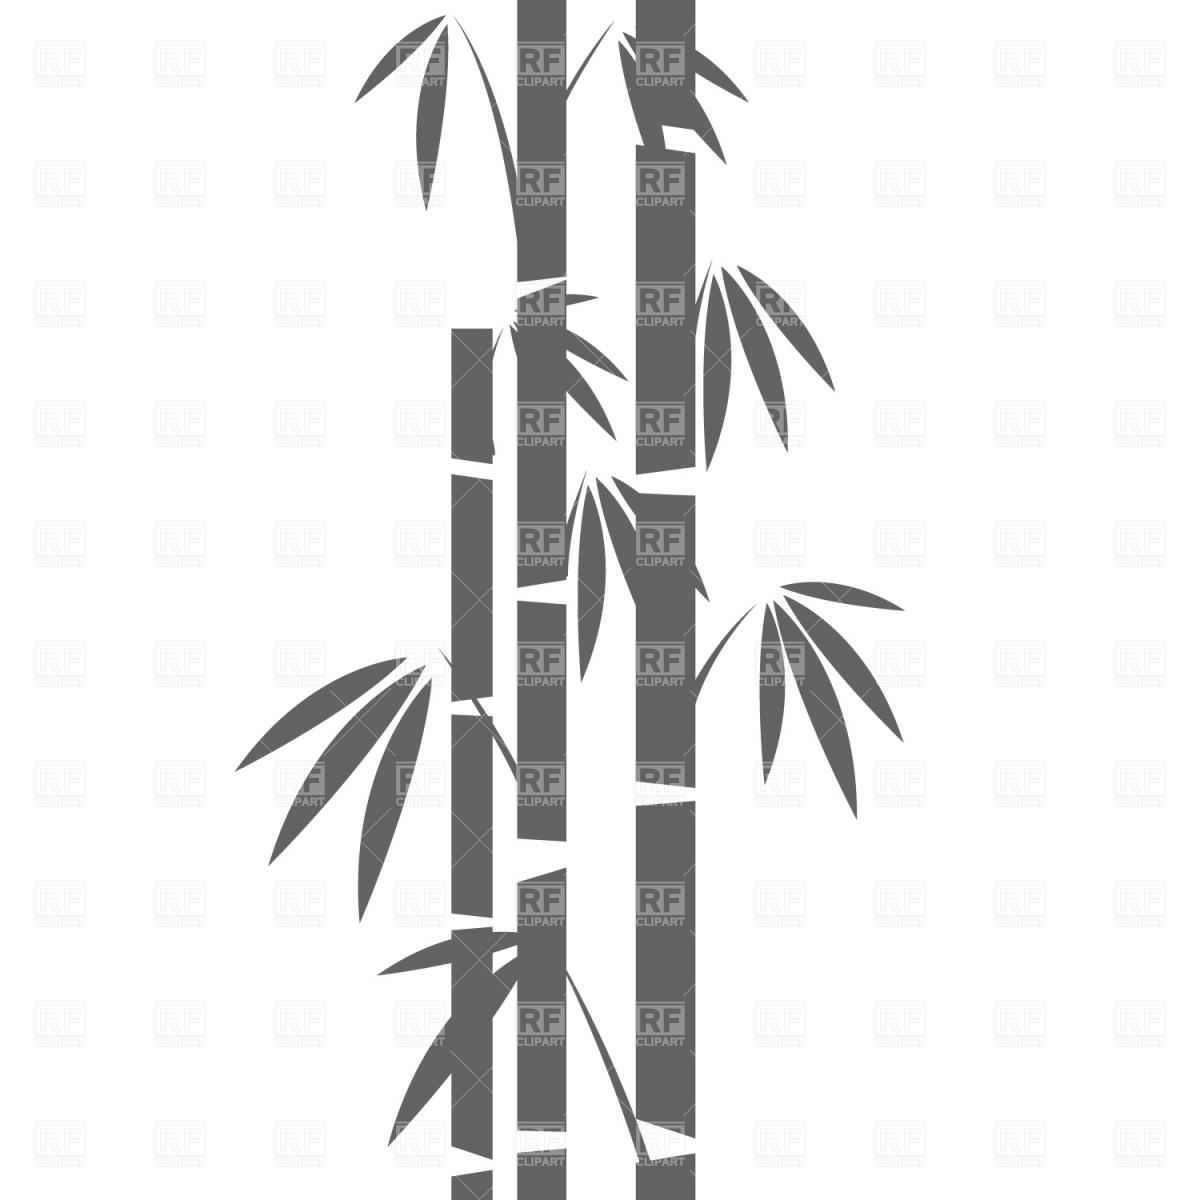 Bamboo Art Design : Bamboo grove photo drawing